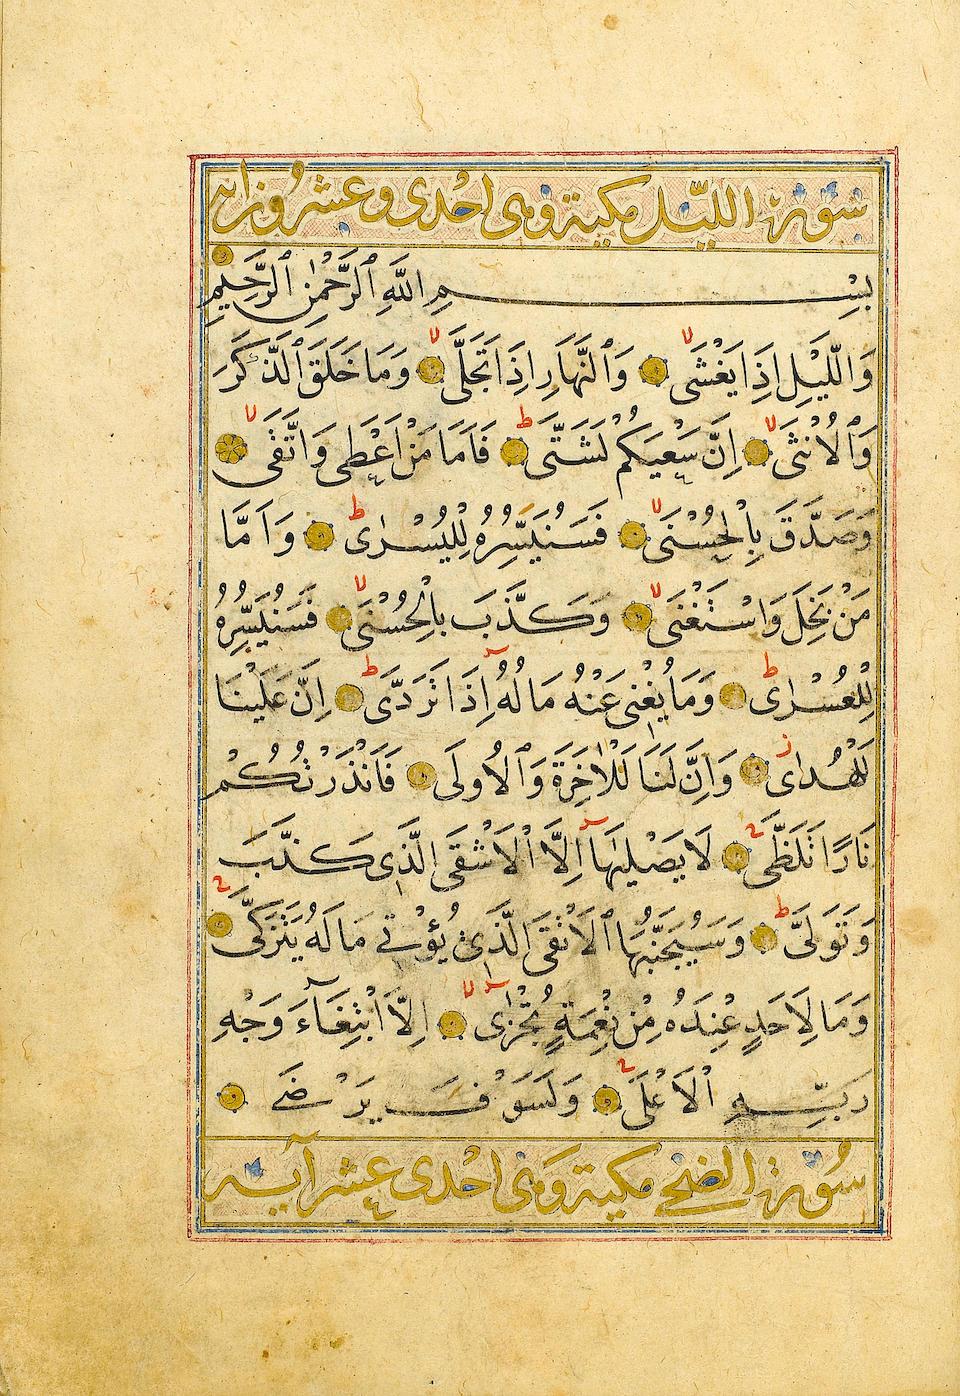 An illuminated Qur'an attributed to Shaykh Hamdullah (b. circa 1436-37, d. 1520), known as Ibn al-Shaykh al-Amasi Ottoman Turkey, probably Constantinople, late 15th Century